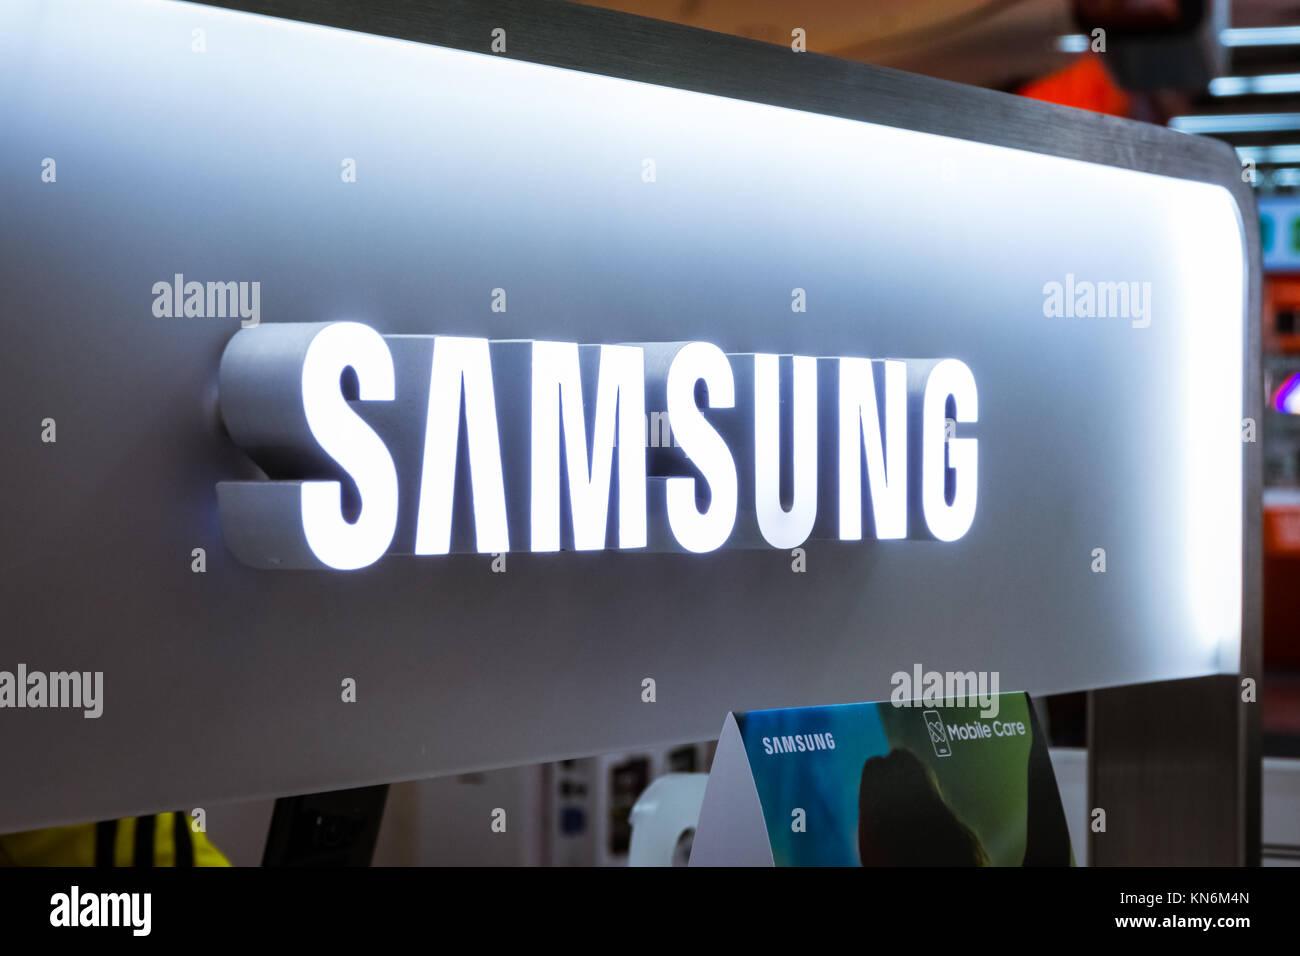 Samsung Logo Electronics Store Technology Display Exhibit October 27 2017 - Stock Image